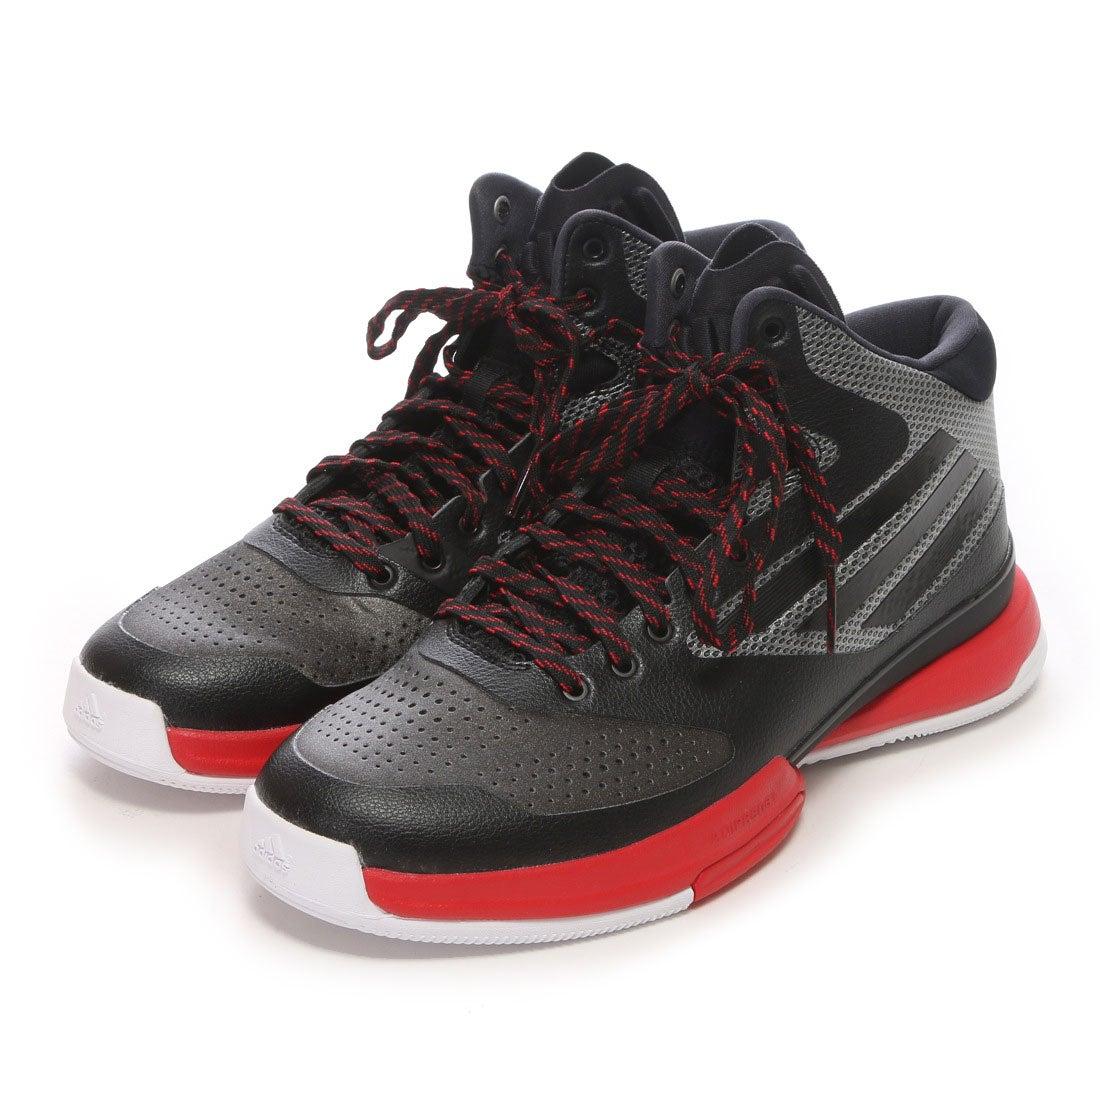 【SALE 50%OFF】アディダス adidas バスケットボールシューズ アディゼロ バッシュ 6 adizero Bash 6 Q16992 (ブラックR)